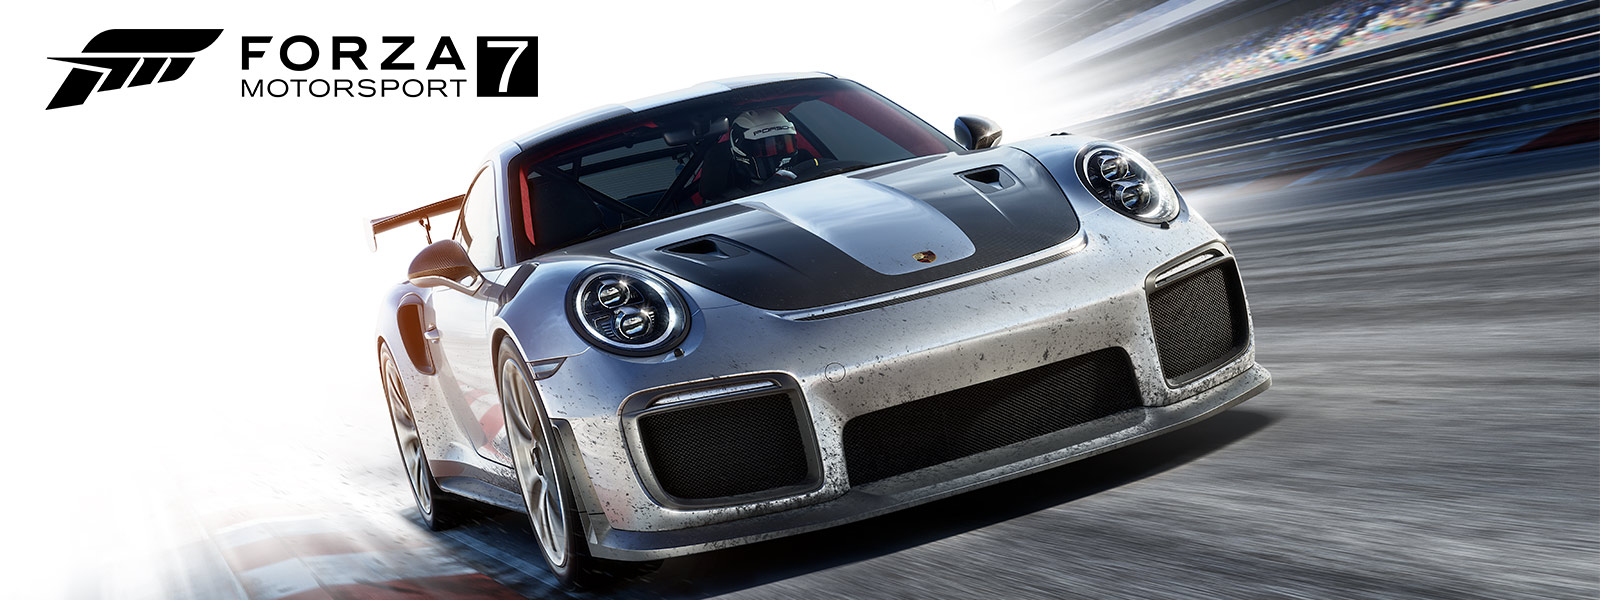 Forza Motorsport 7 게임 화면